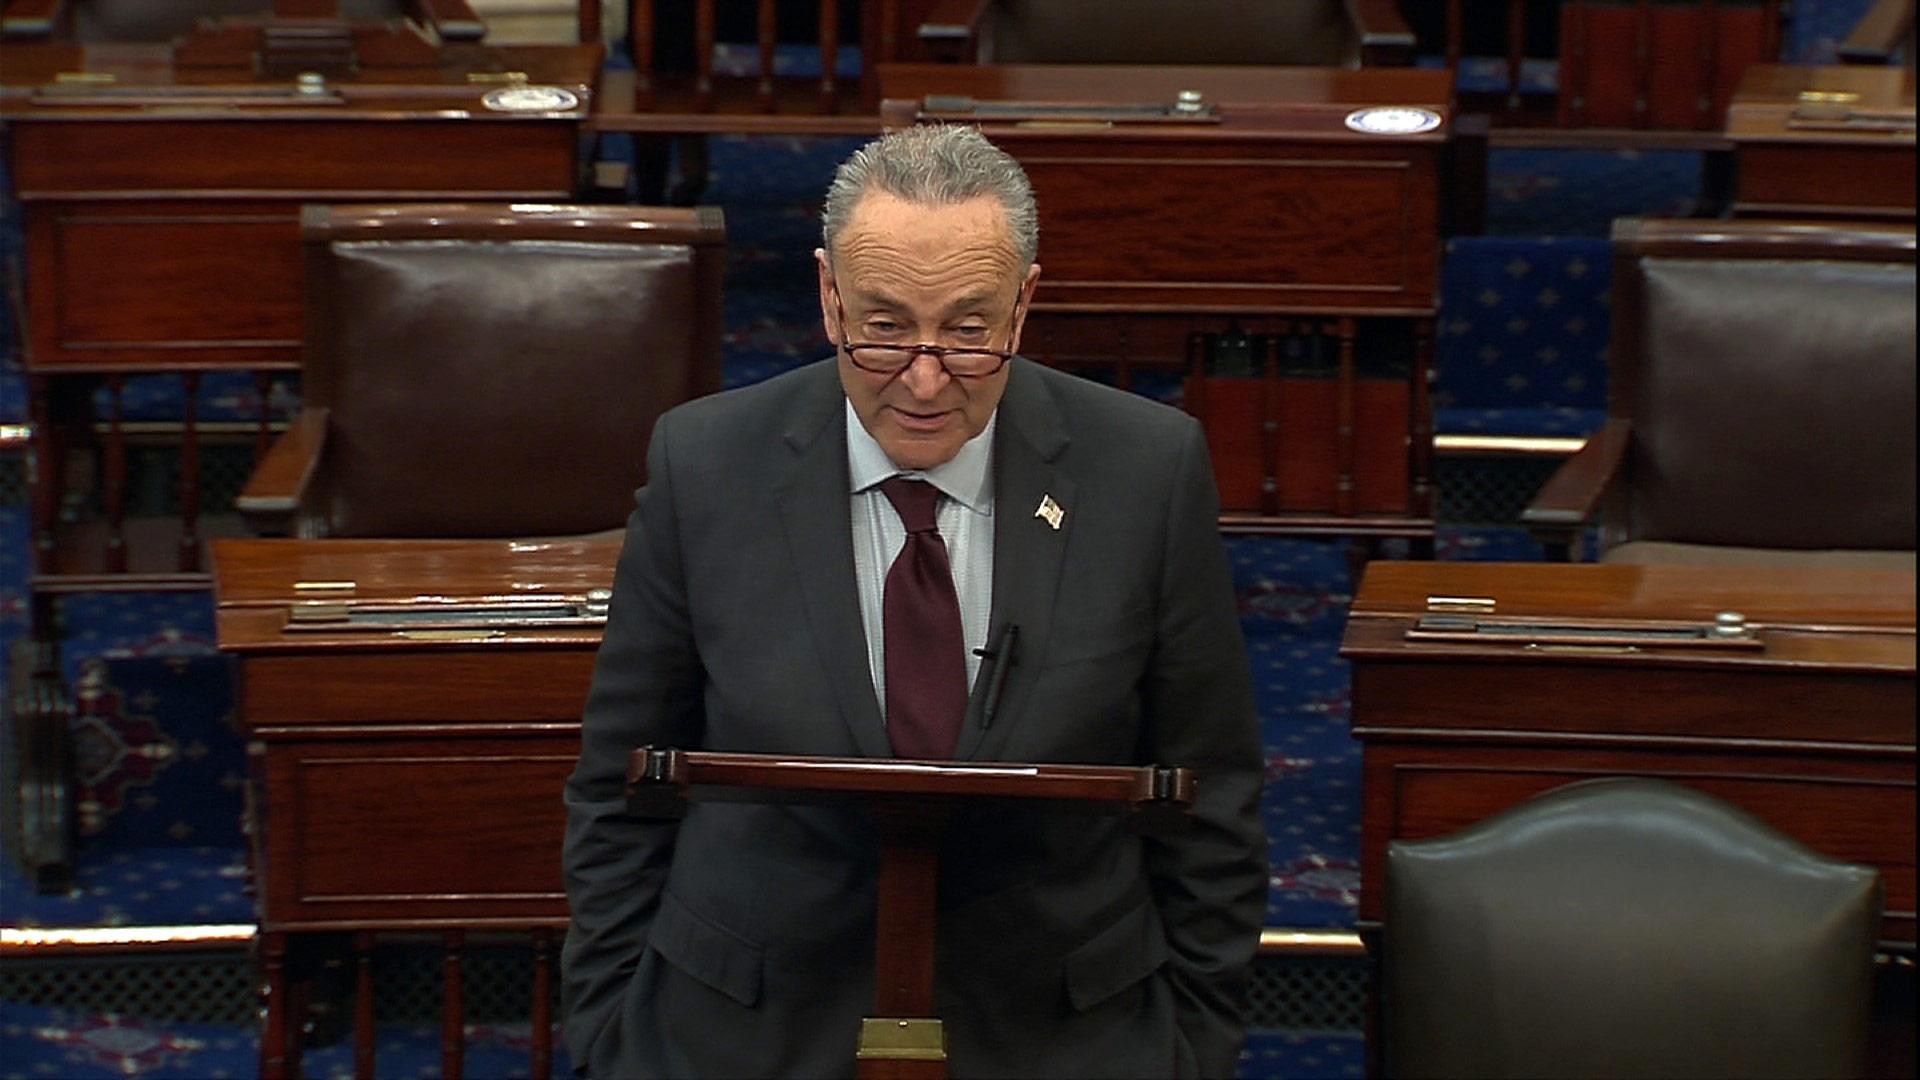 Senate Majority Leader Chuck Schumer speaks on the Senate floor on Tuesday, February 2.